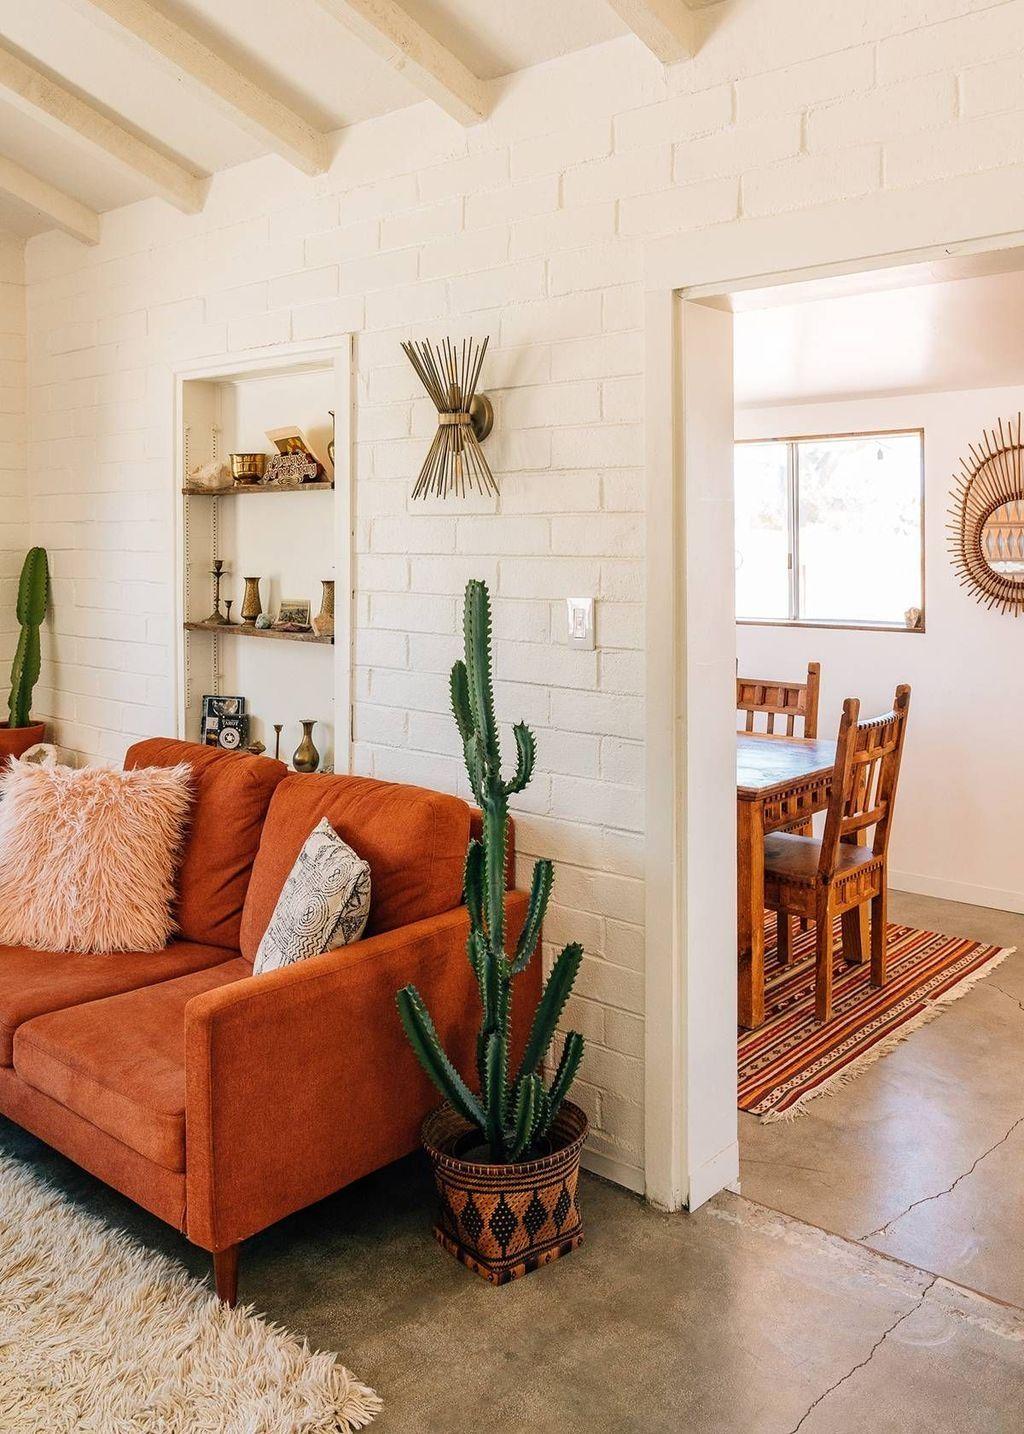 20+ Astonishing Home Design Ideas COODECOR Home decor